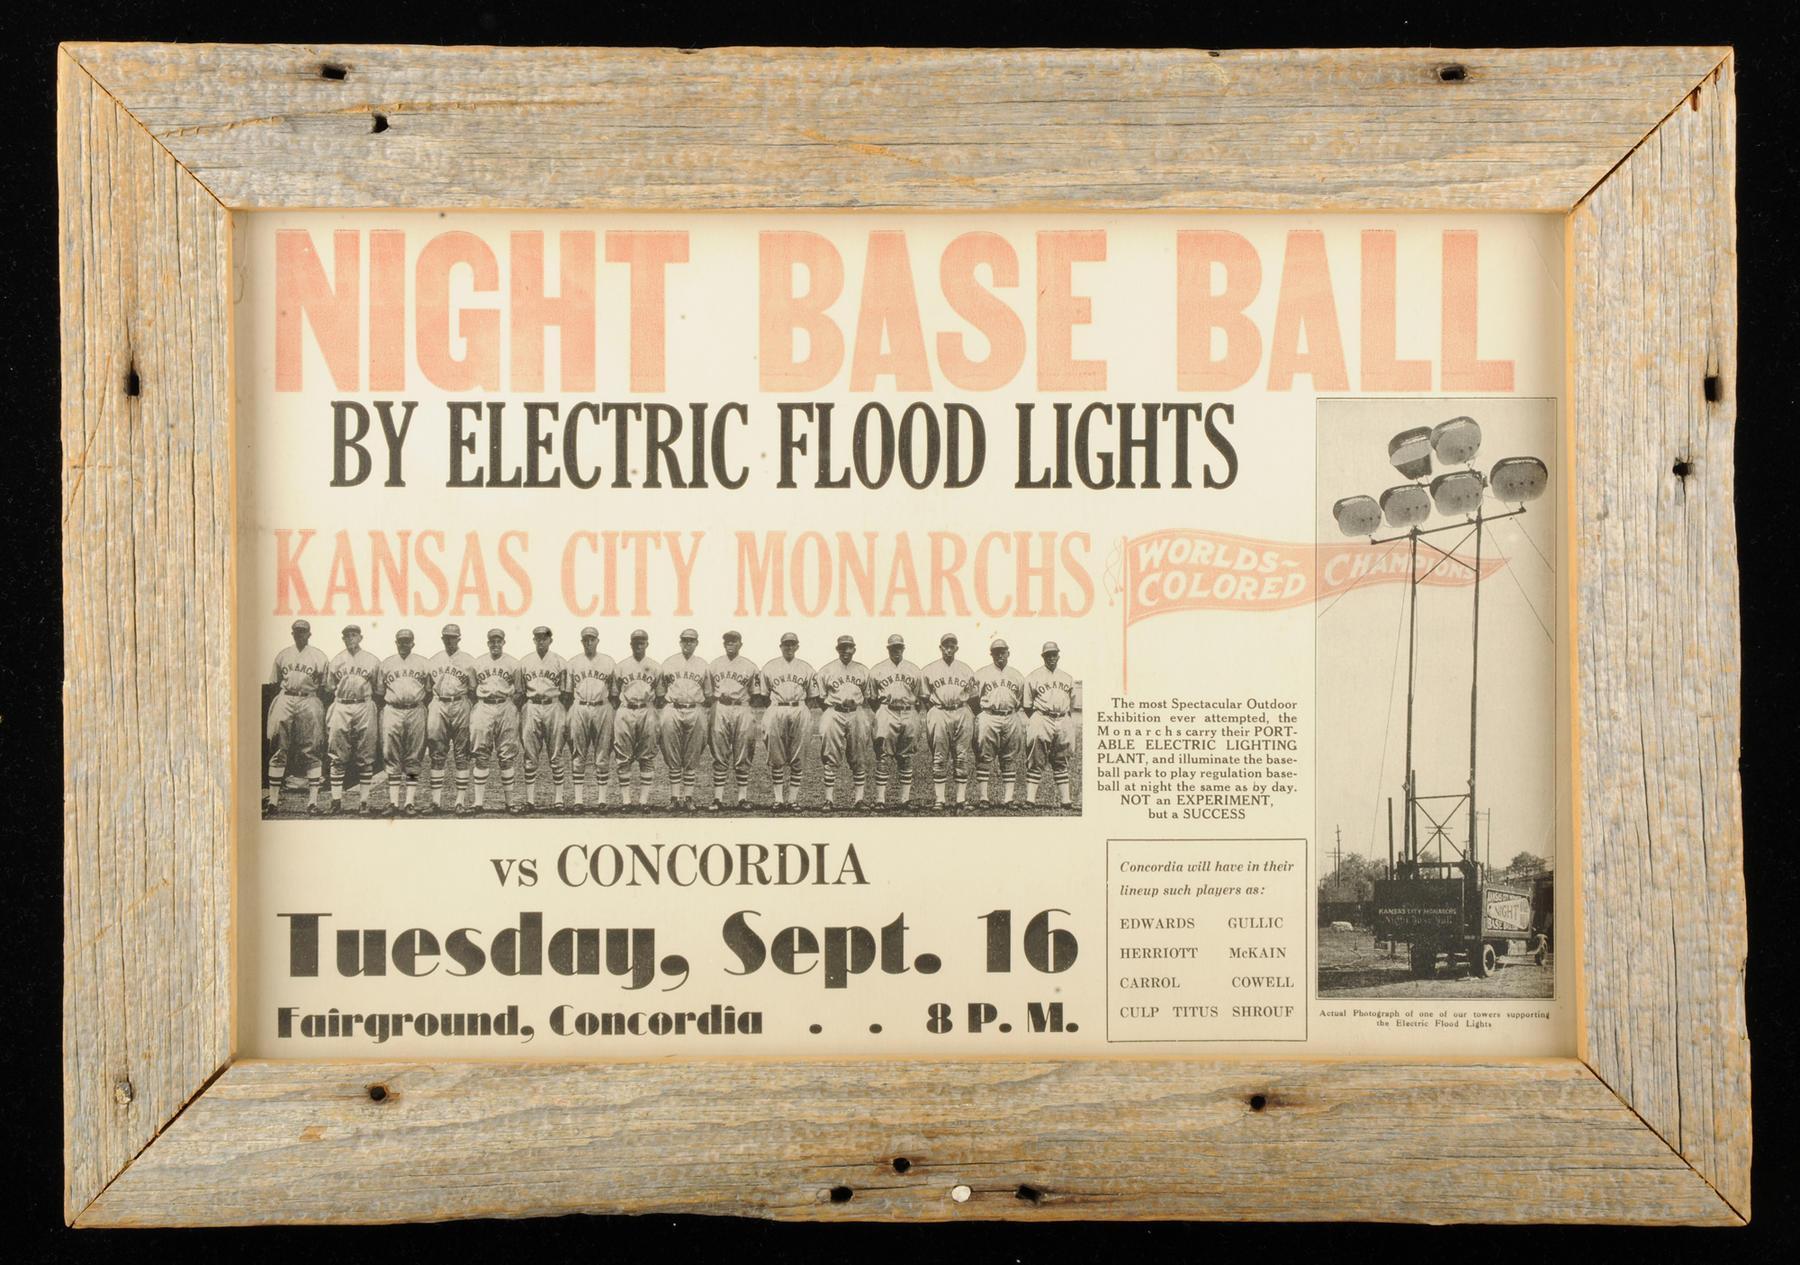 Night baseball poster, Kansas City Monarchs vs Concordia, c. 1928 - B-165-88 (National Baseball Hall of Fame Library)